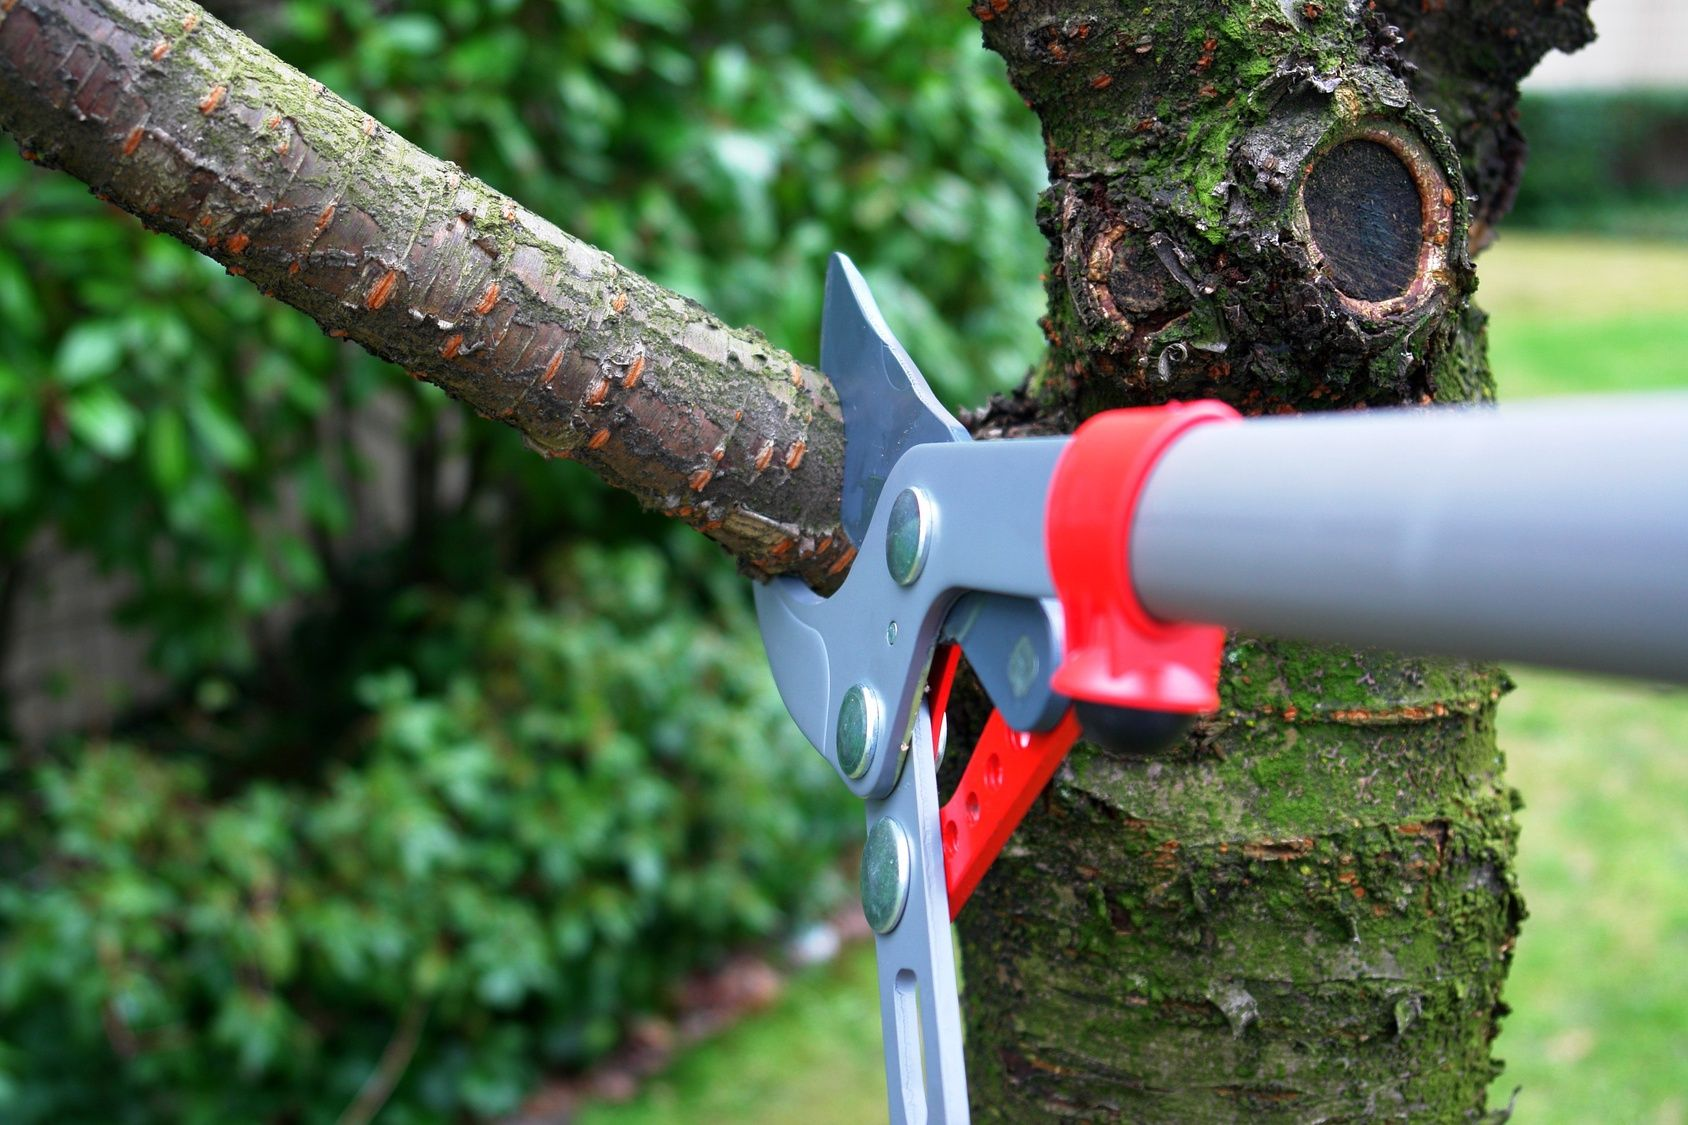 A Professional Tree Care Company Like Provincial Trees